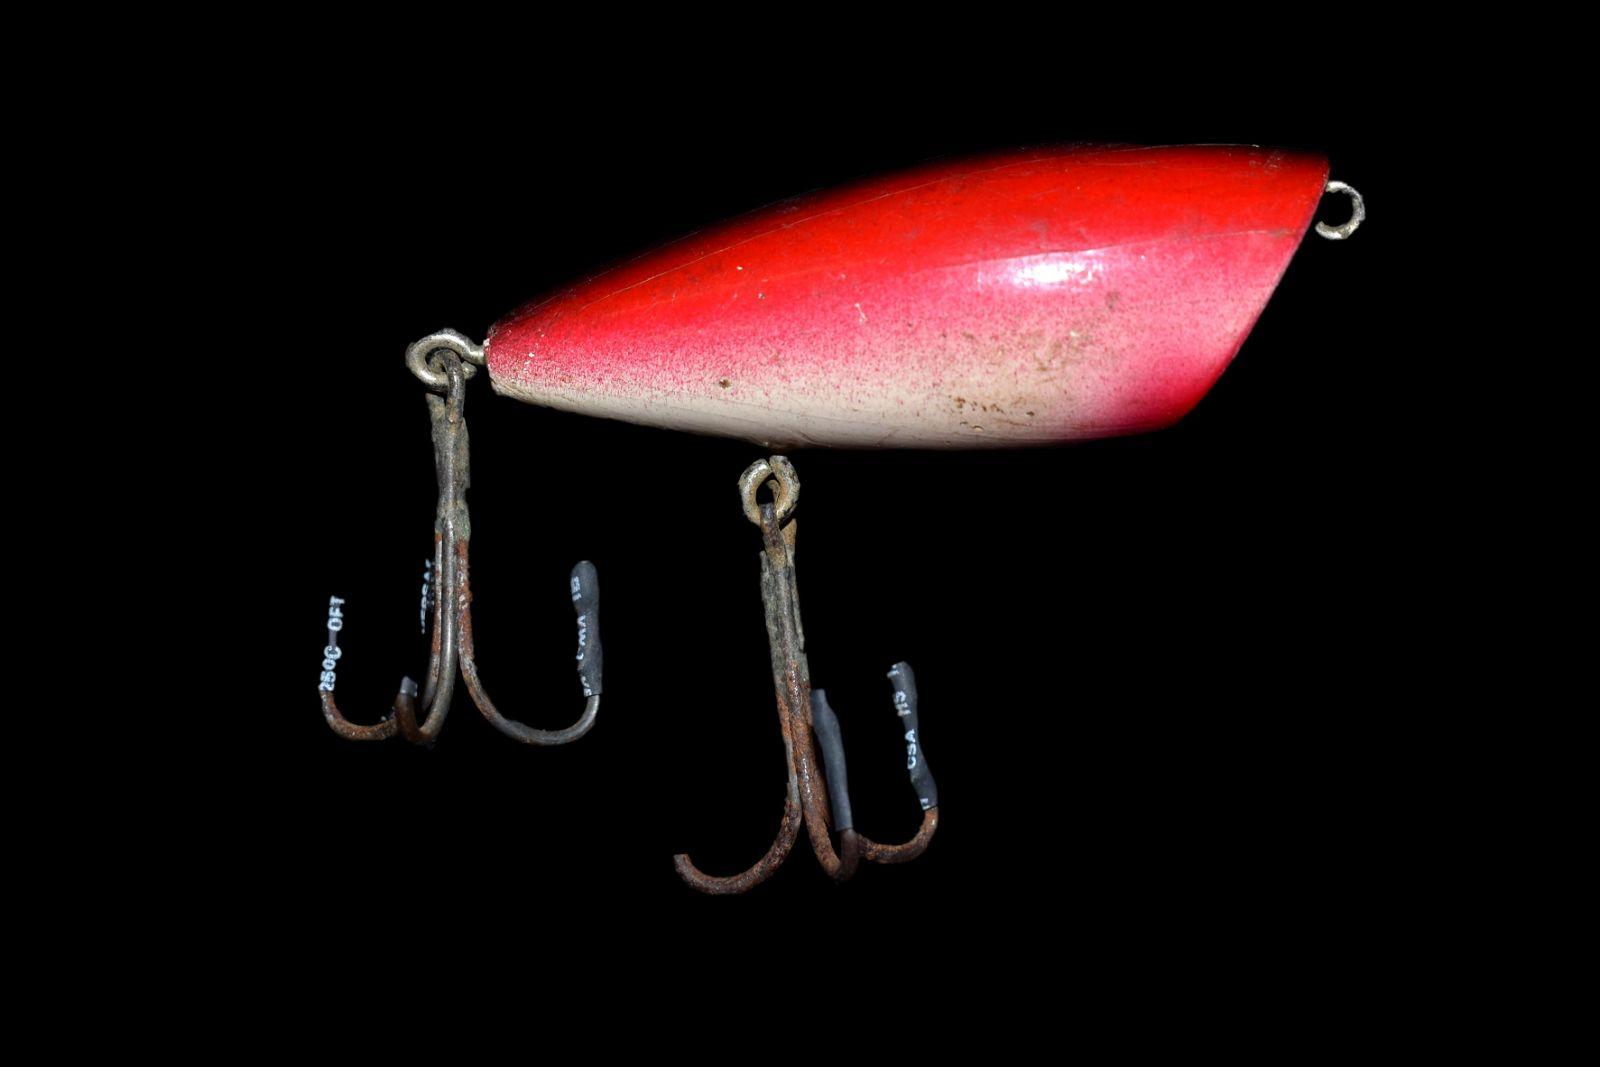 VINTAGE FISHING LURE